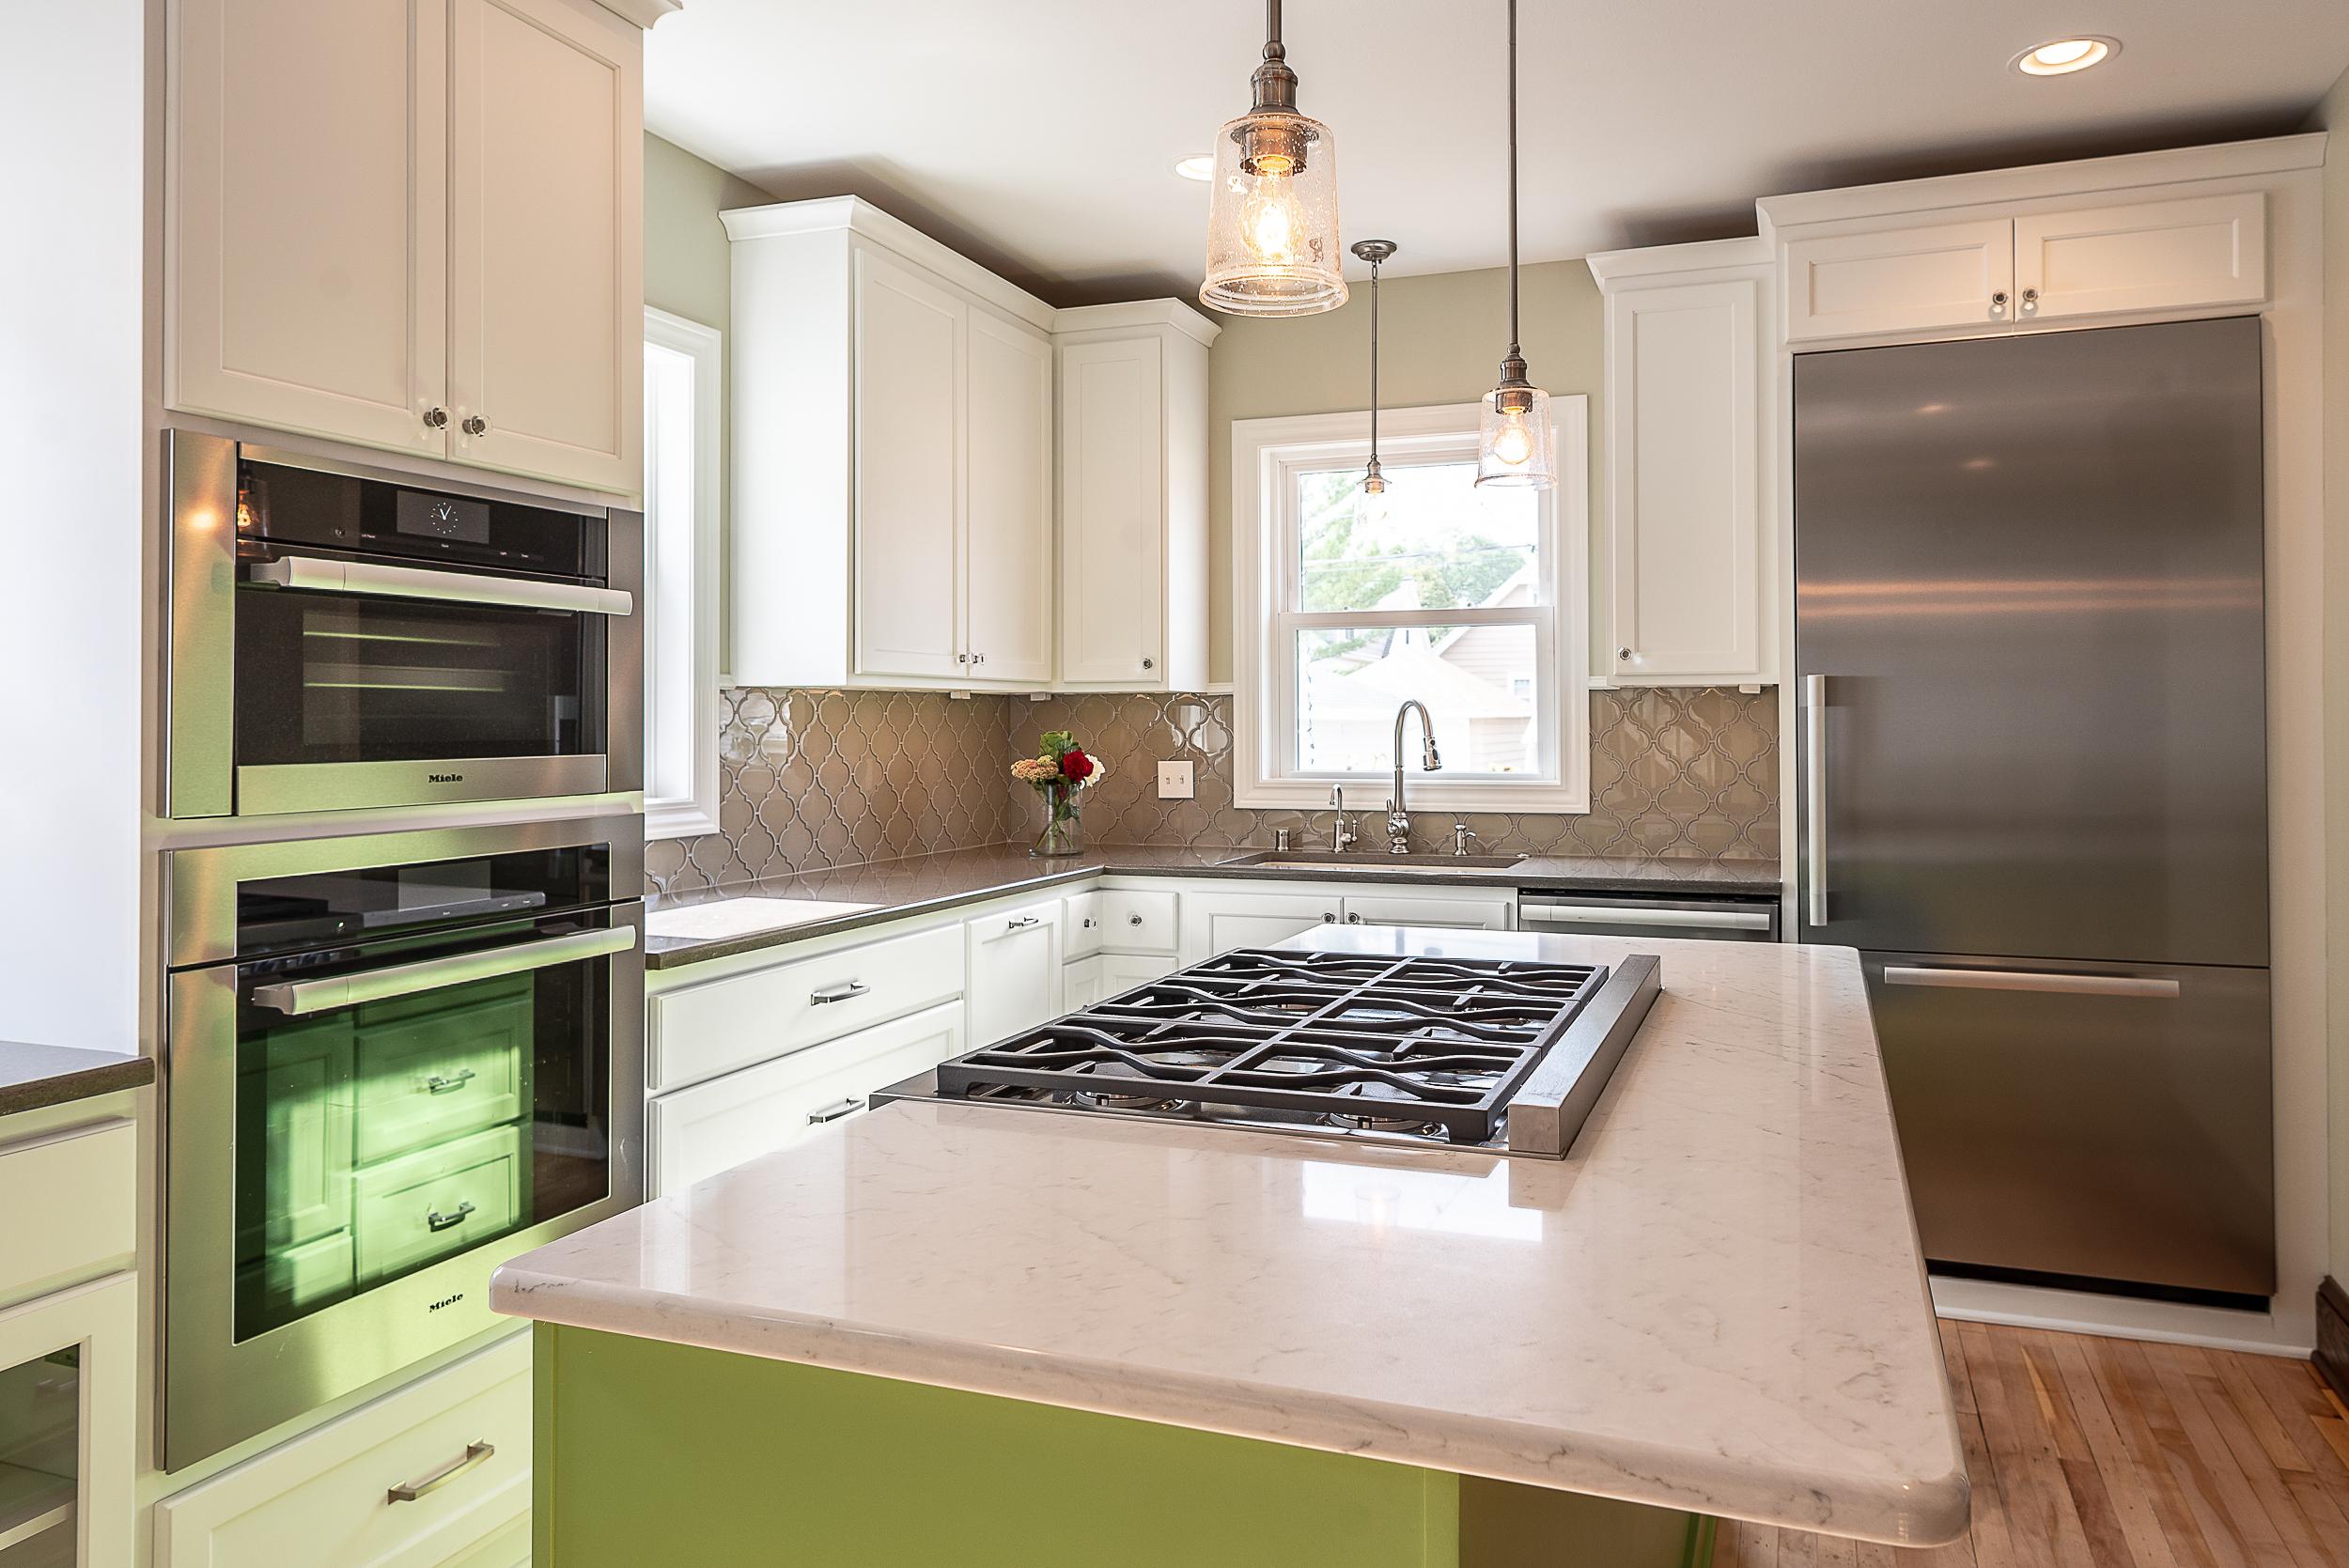 MKE Design Build - fresh and clean  kitchen renovation. www.mkedesignbuild.com